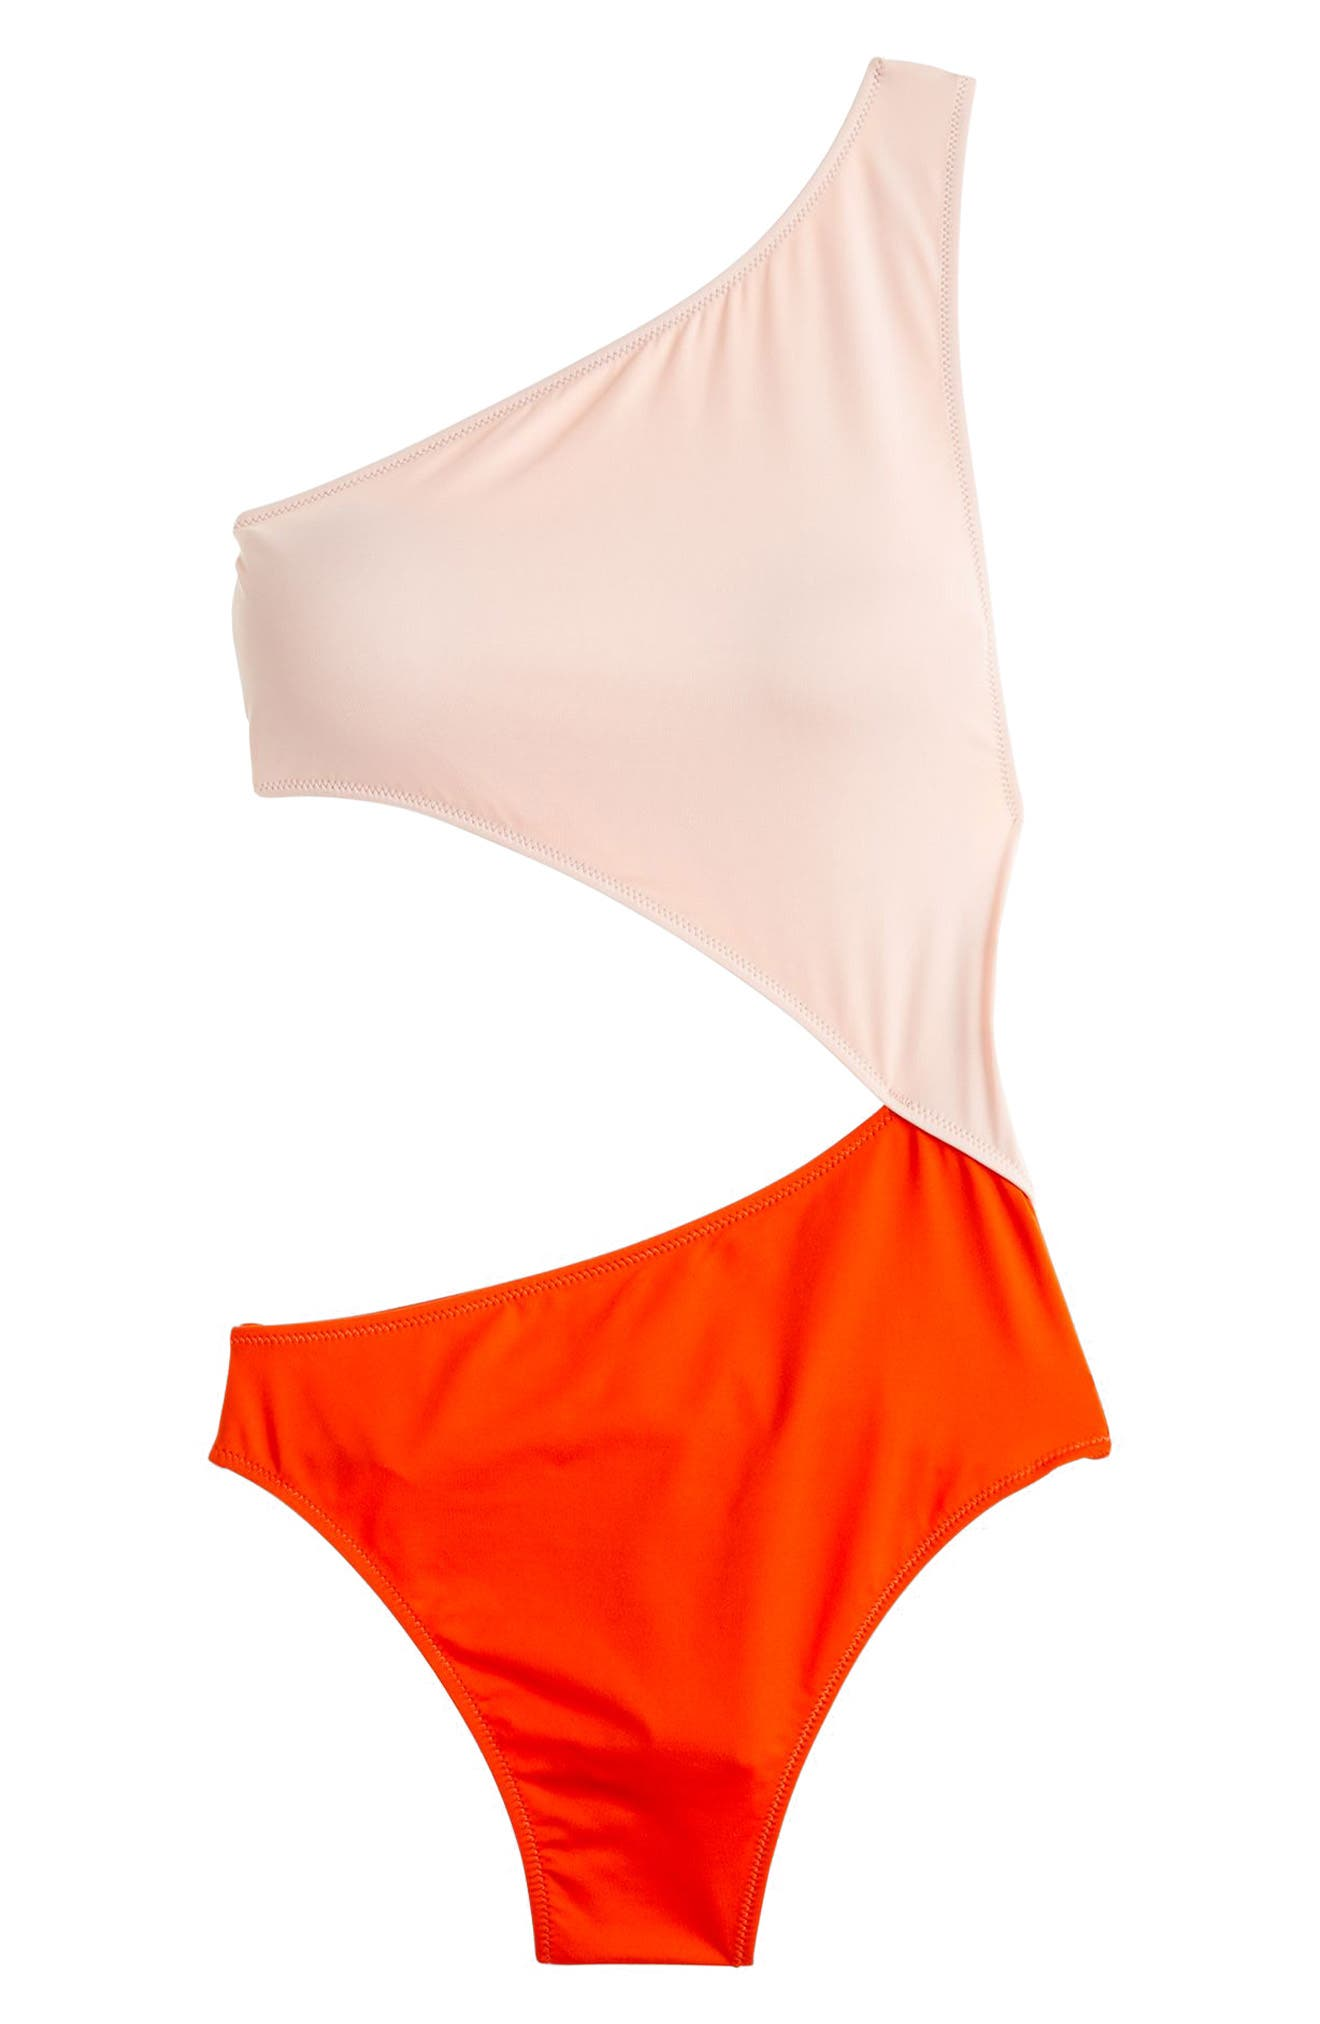 Playa Tilden Colorblock One-Piece Swimsuit,                             Alternate thumbnail 3, color,                             Cerise Rose